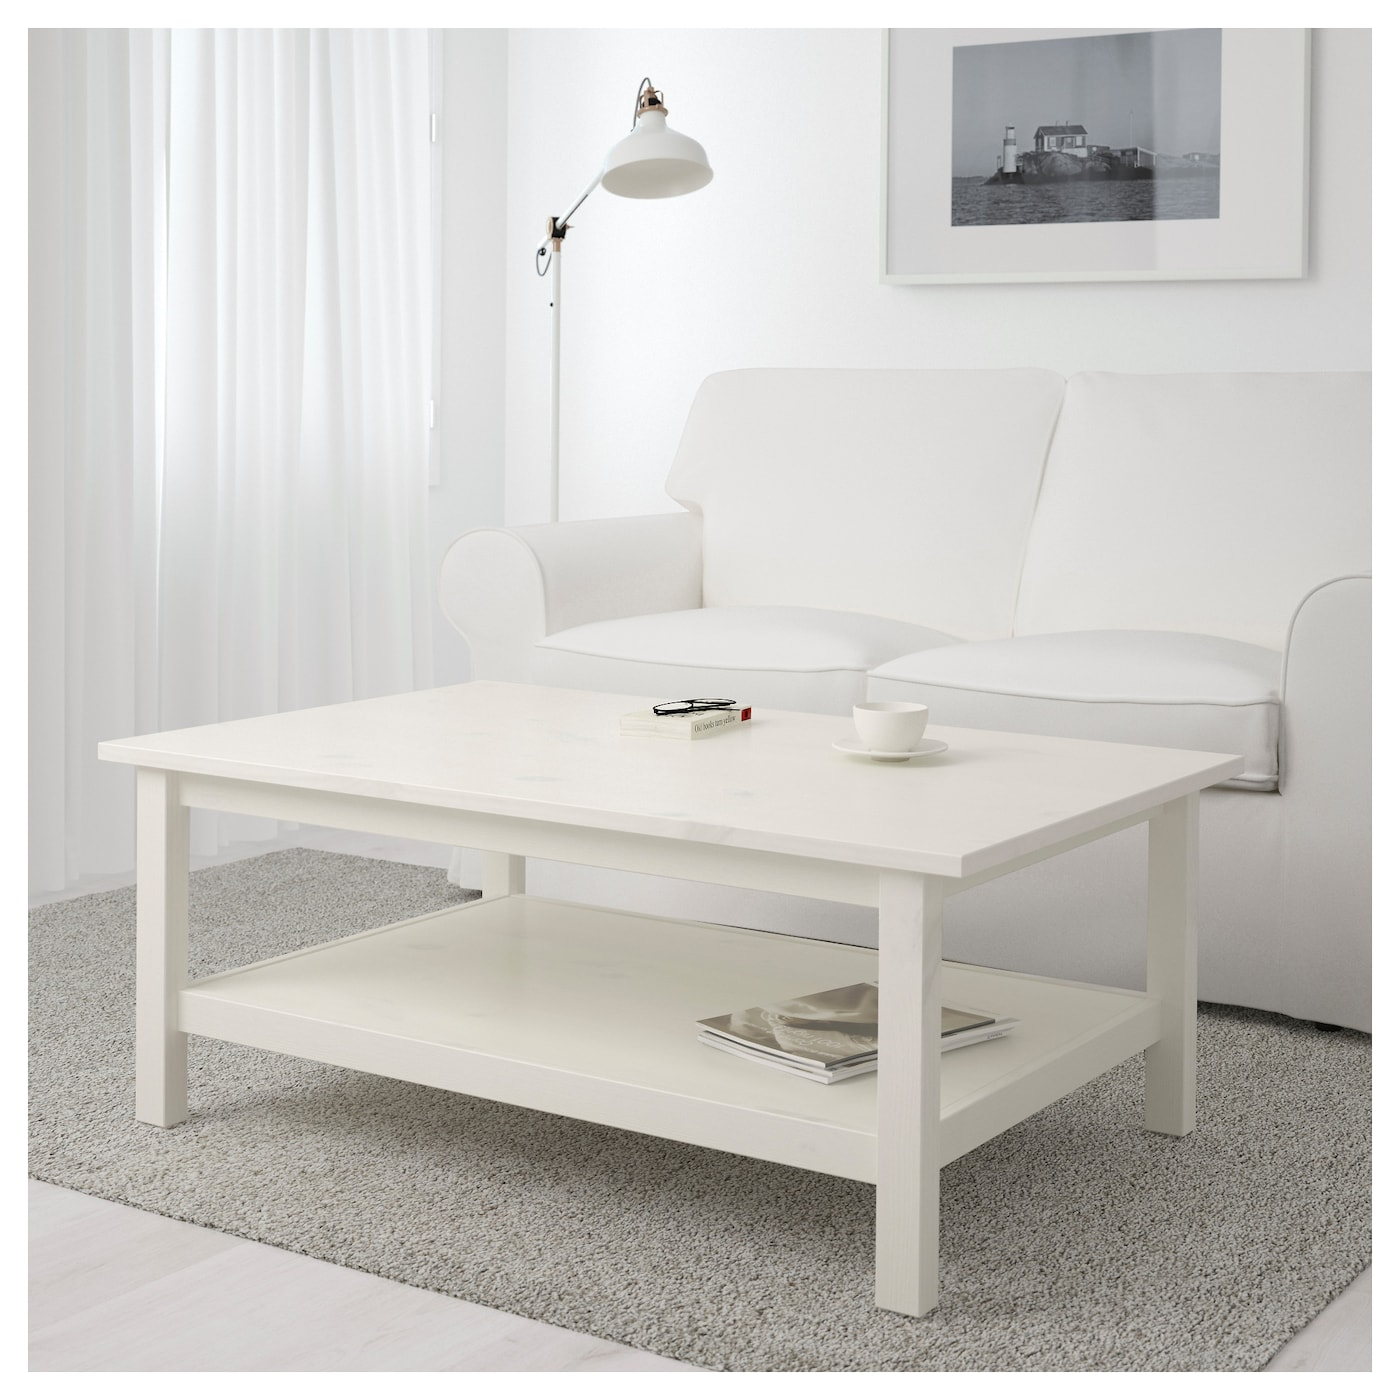 Hemnes Side Table Black Brown 55x55 Cm: HEMNES Coffee Table White Stain 118 X 75 Cm